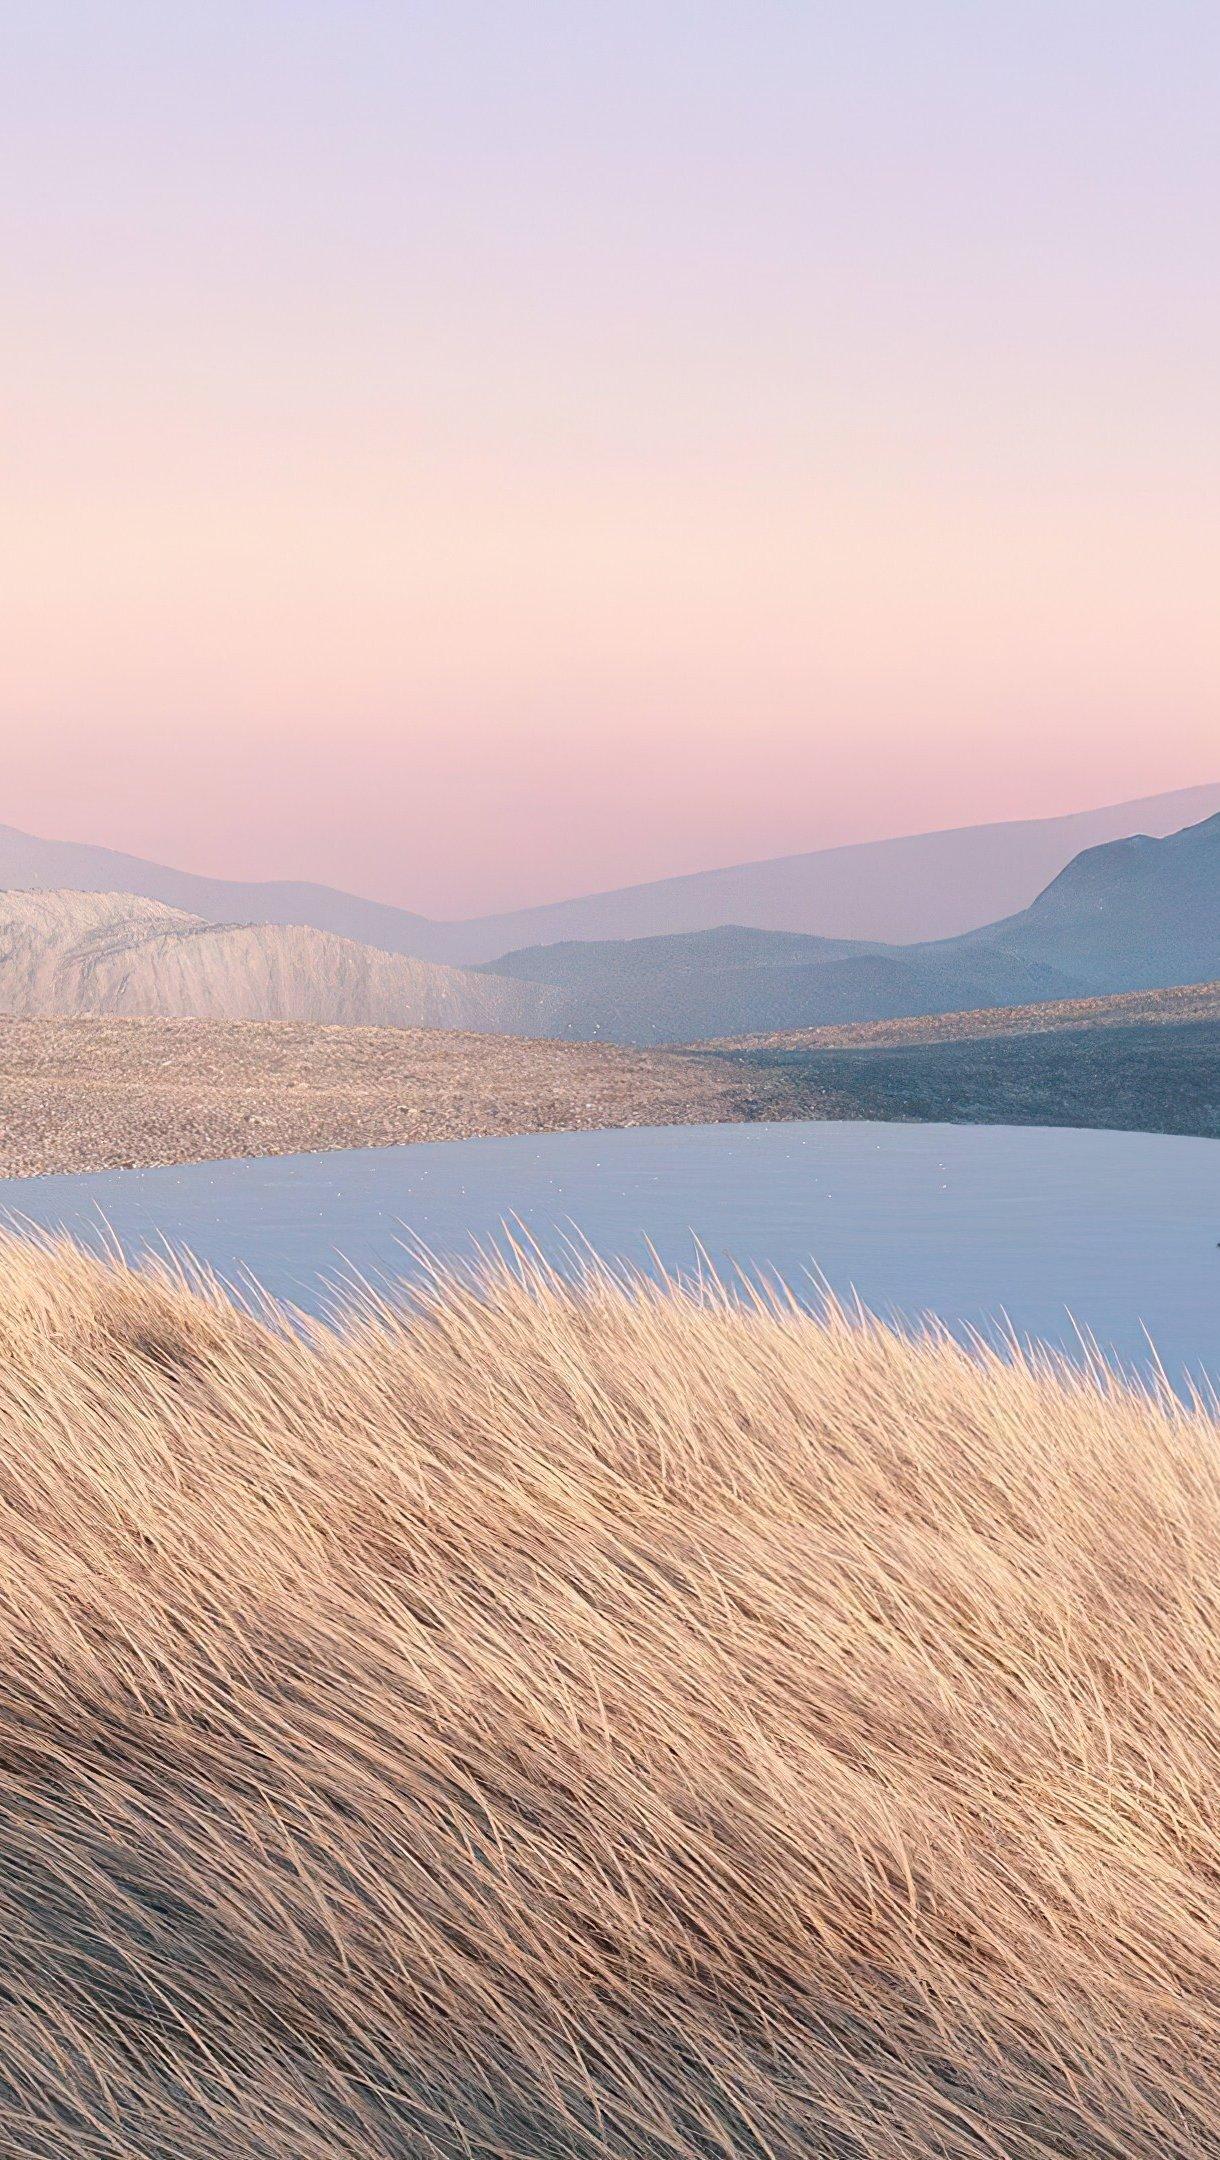 Fondos de pantalla Paisaje digital de montañas Vertical